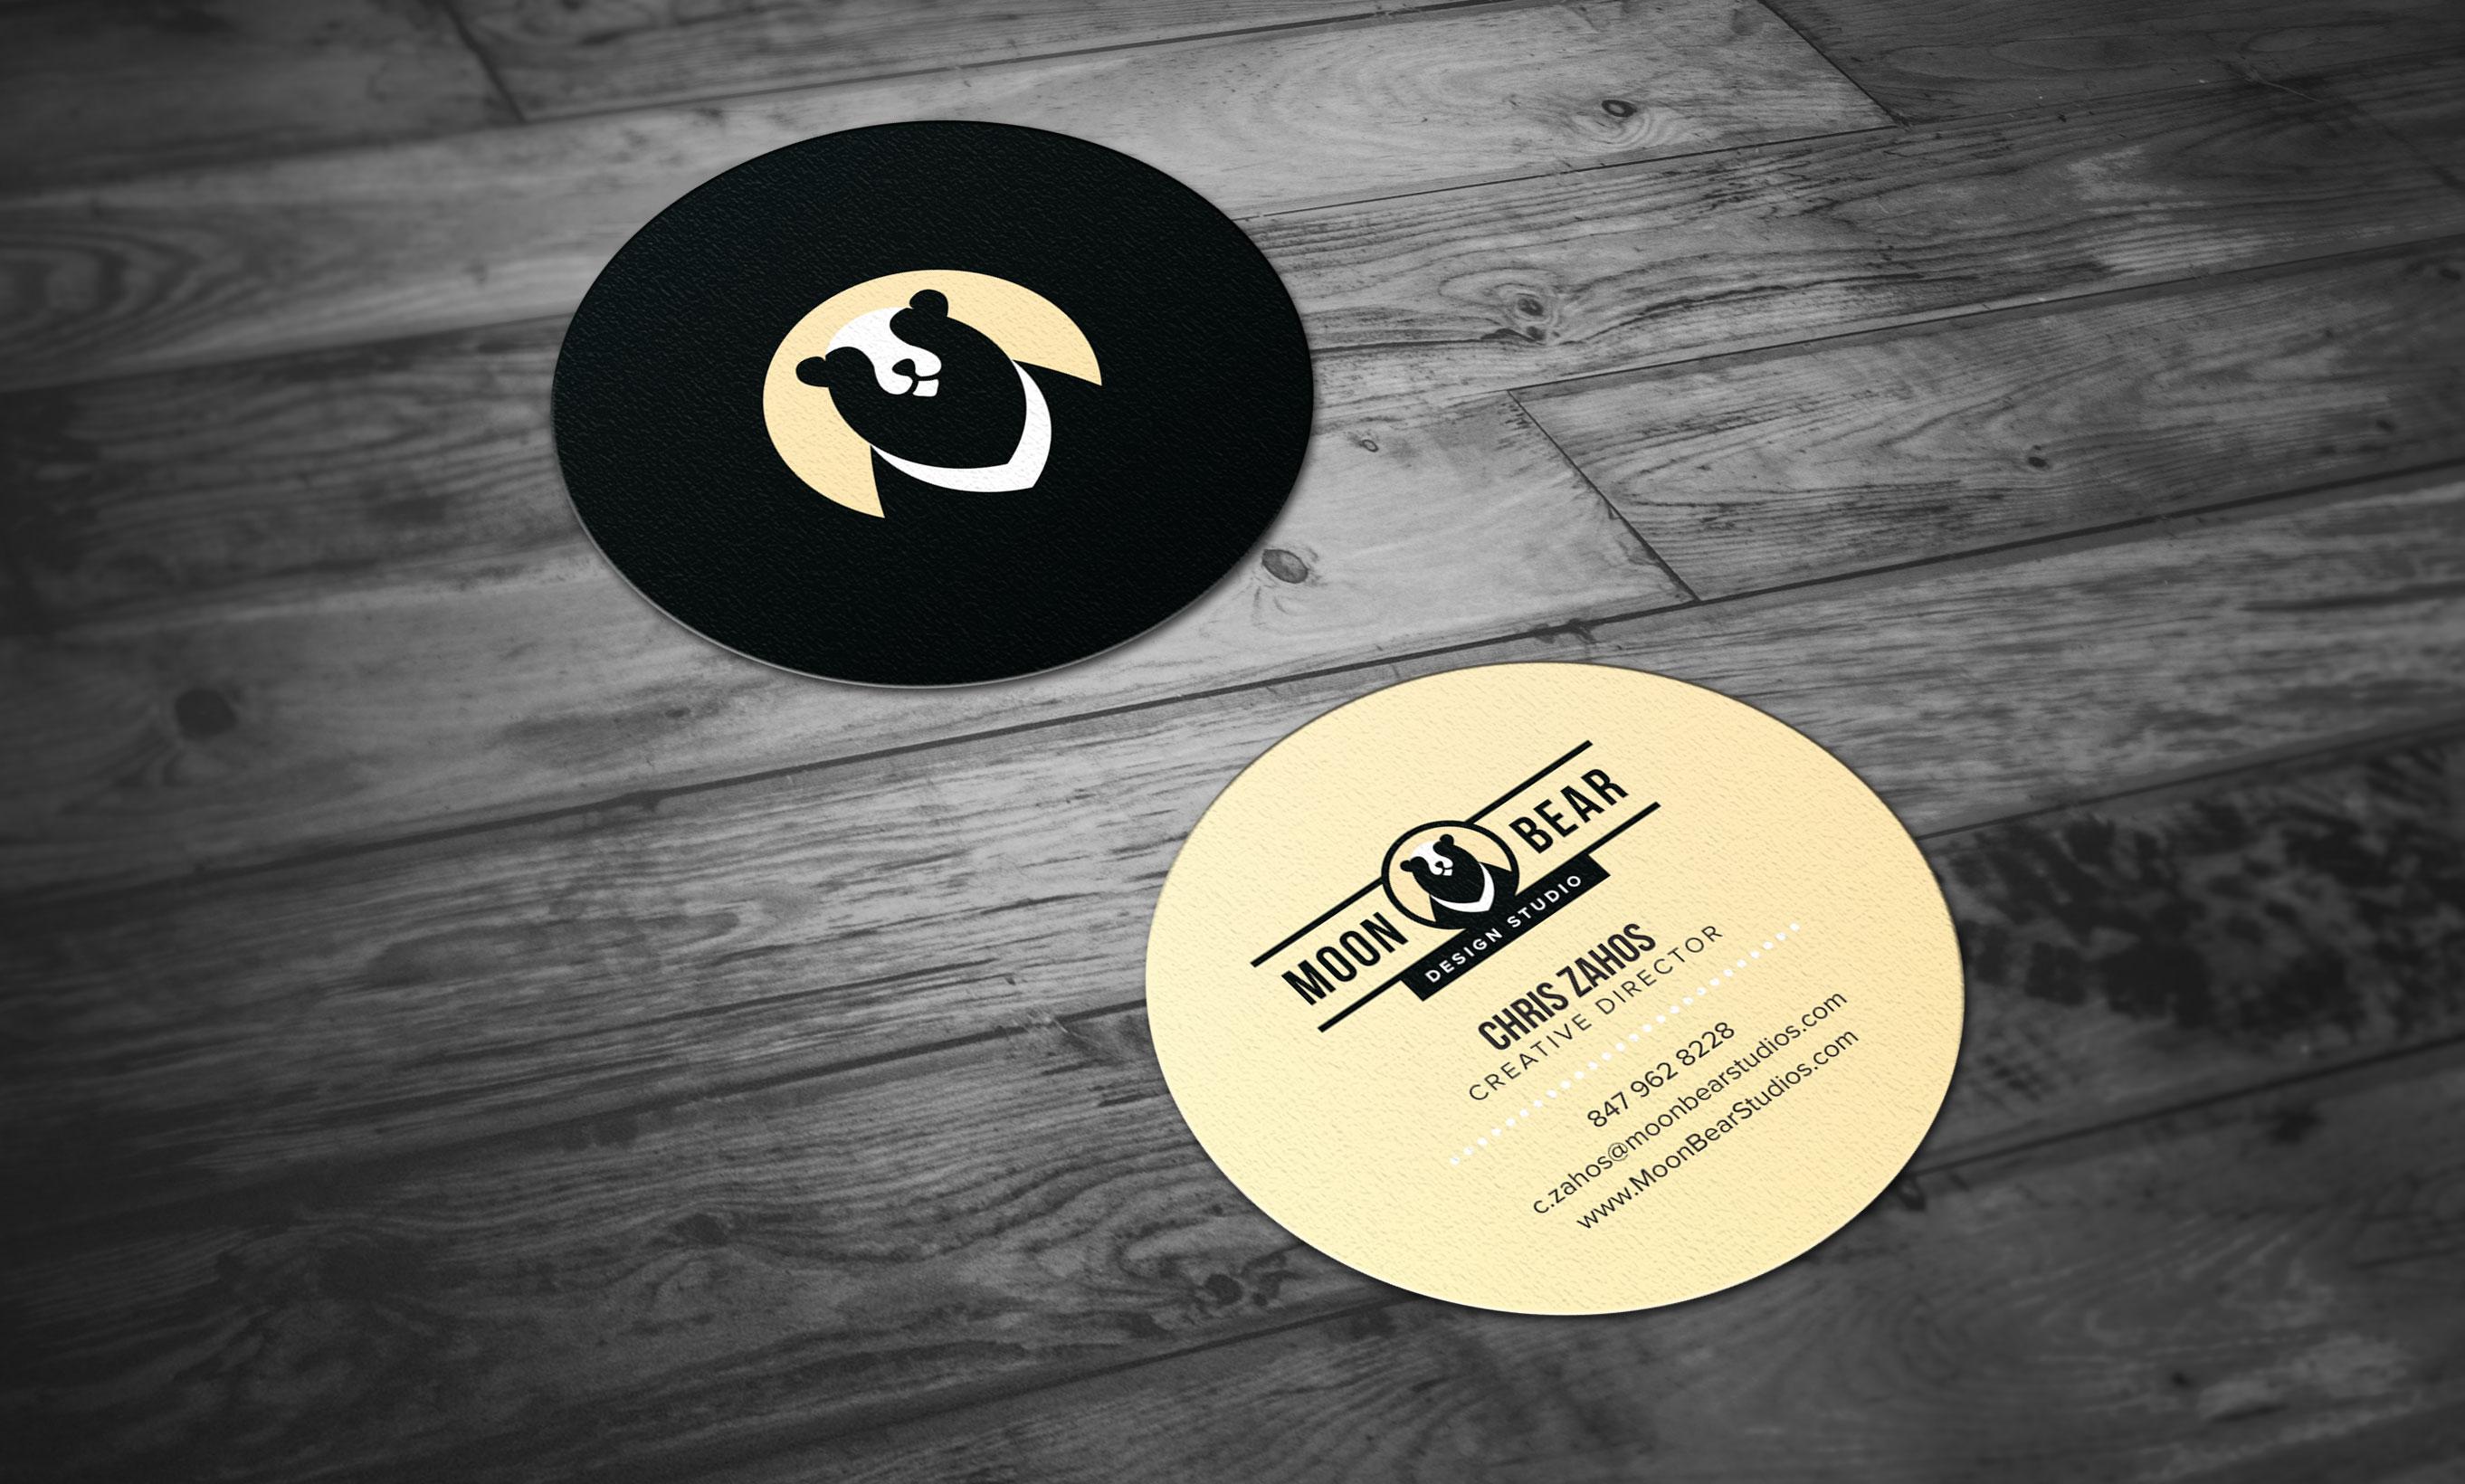 Cute moon business cards contemporary business card ideas etadam brand identity and responsive web design moon bear design studio colourmoves Images